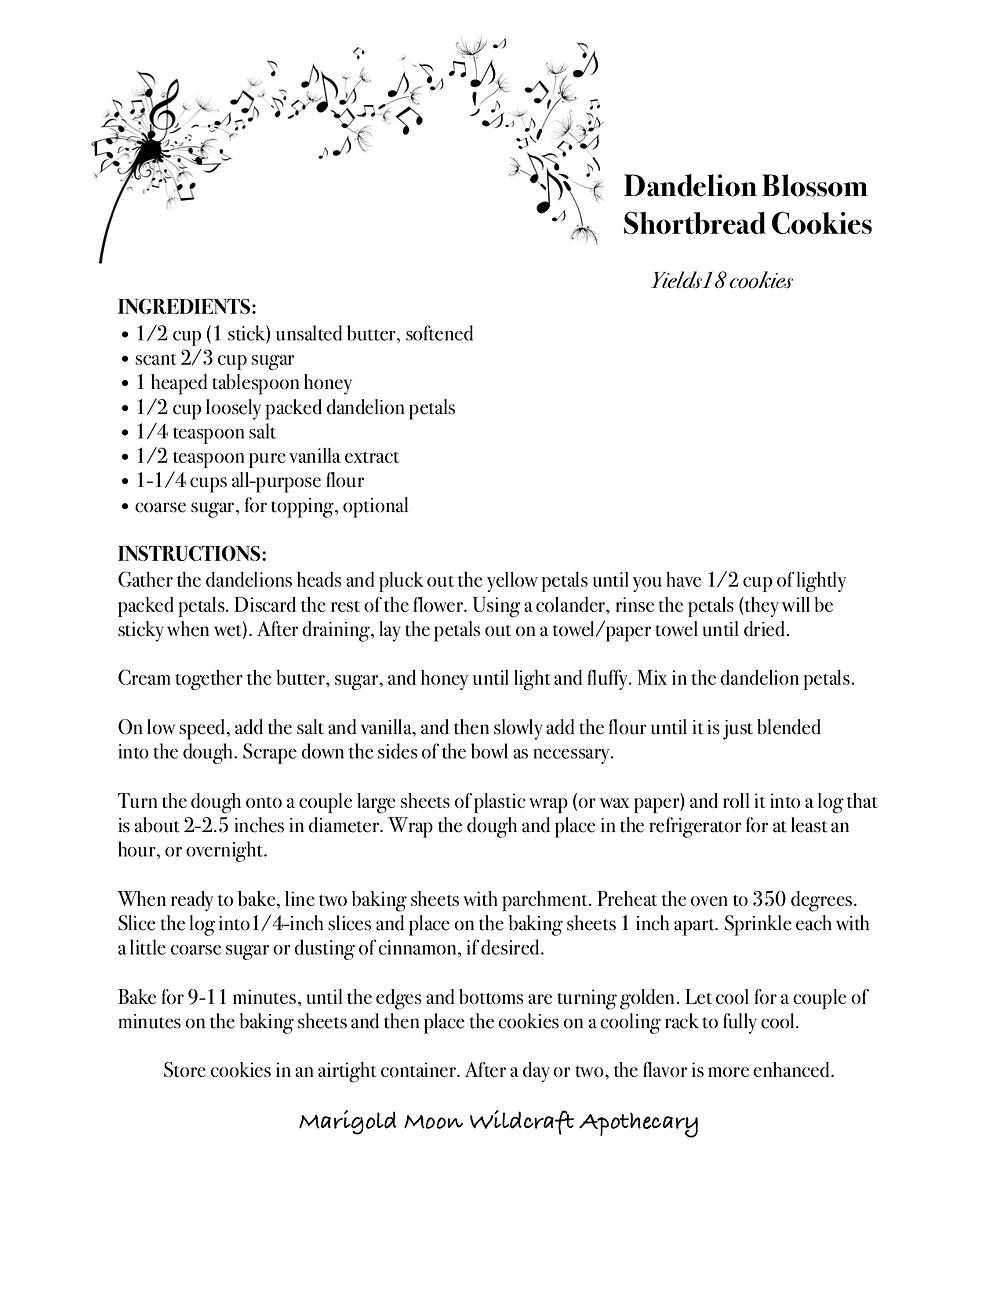 Dandelion Blossom Shortbread Cookies